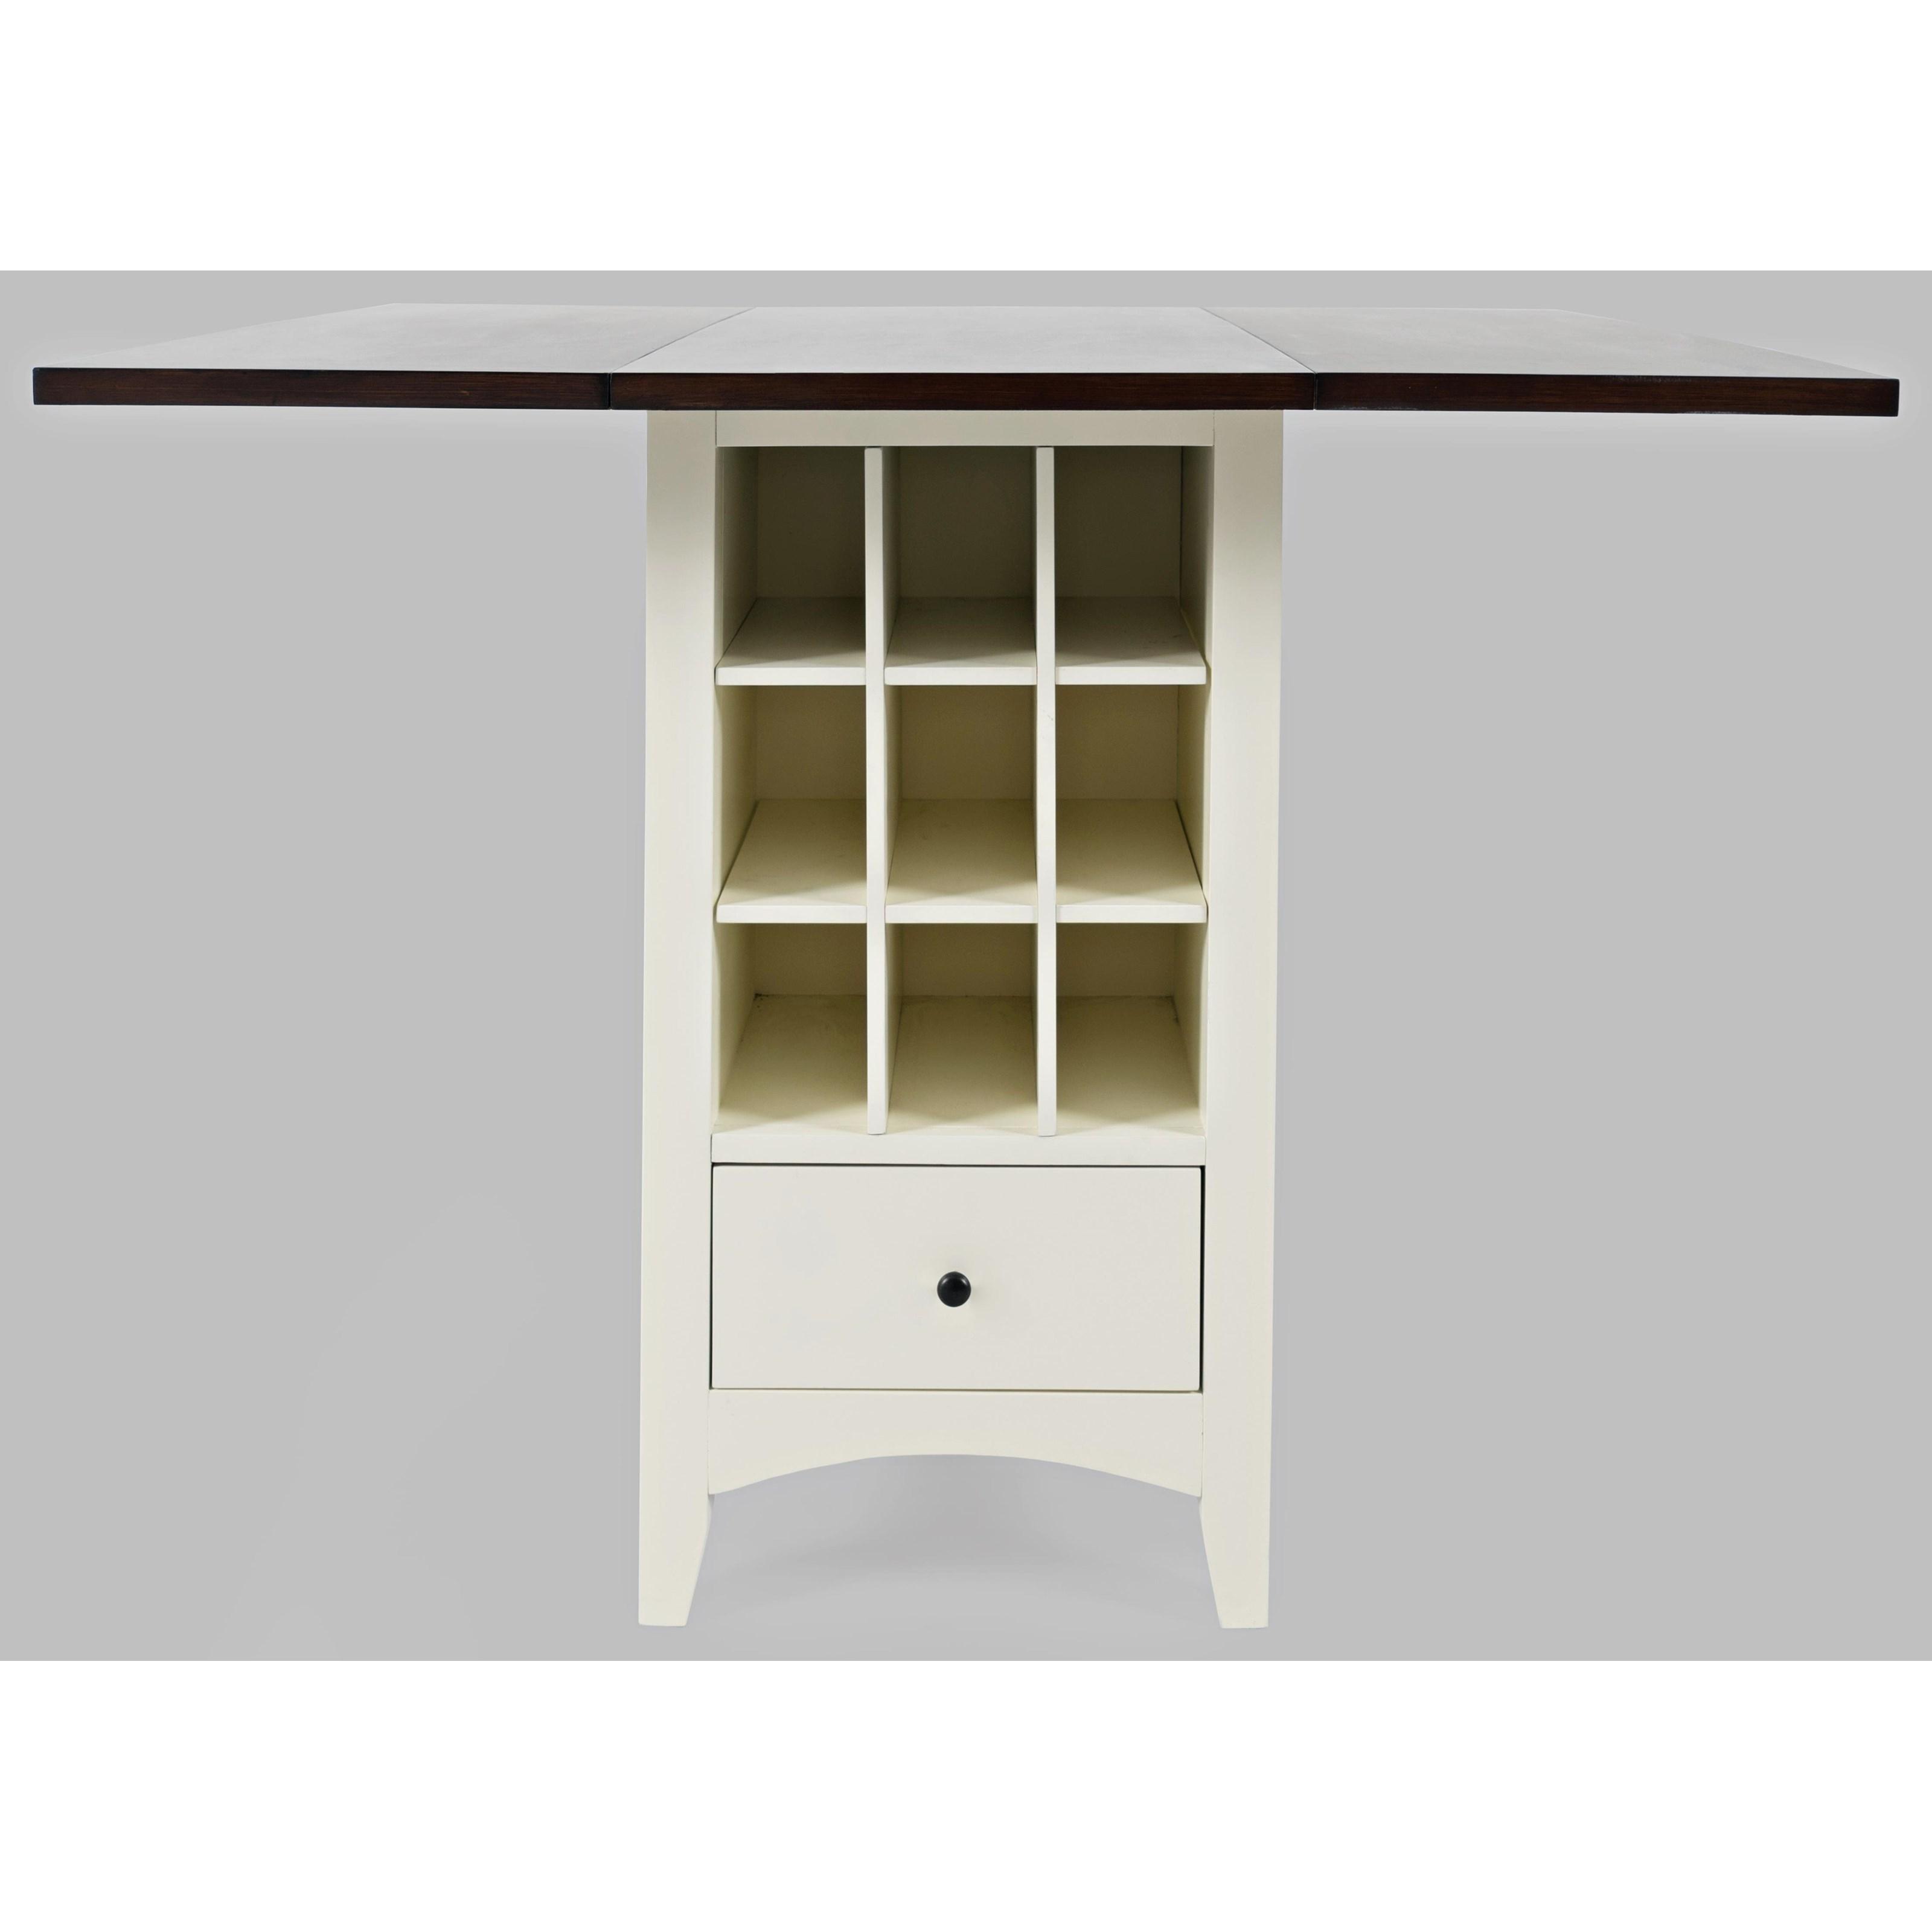 Asbury Park Storage Counter Dropleaf  by VFM Signature at Virginia Furniture Market